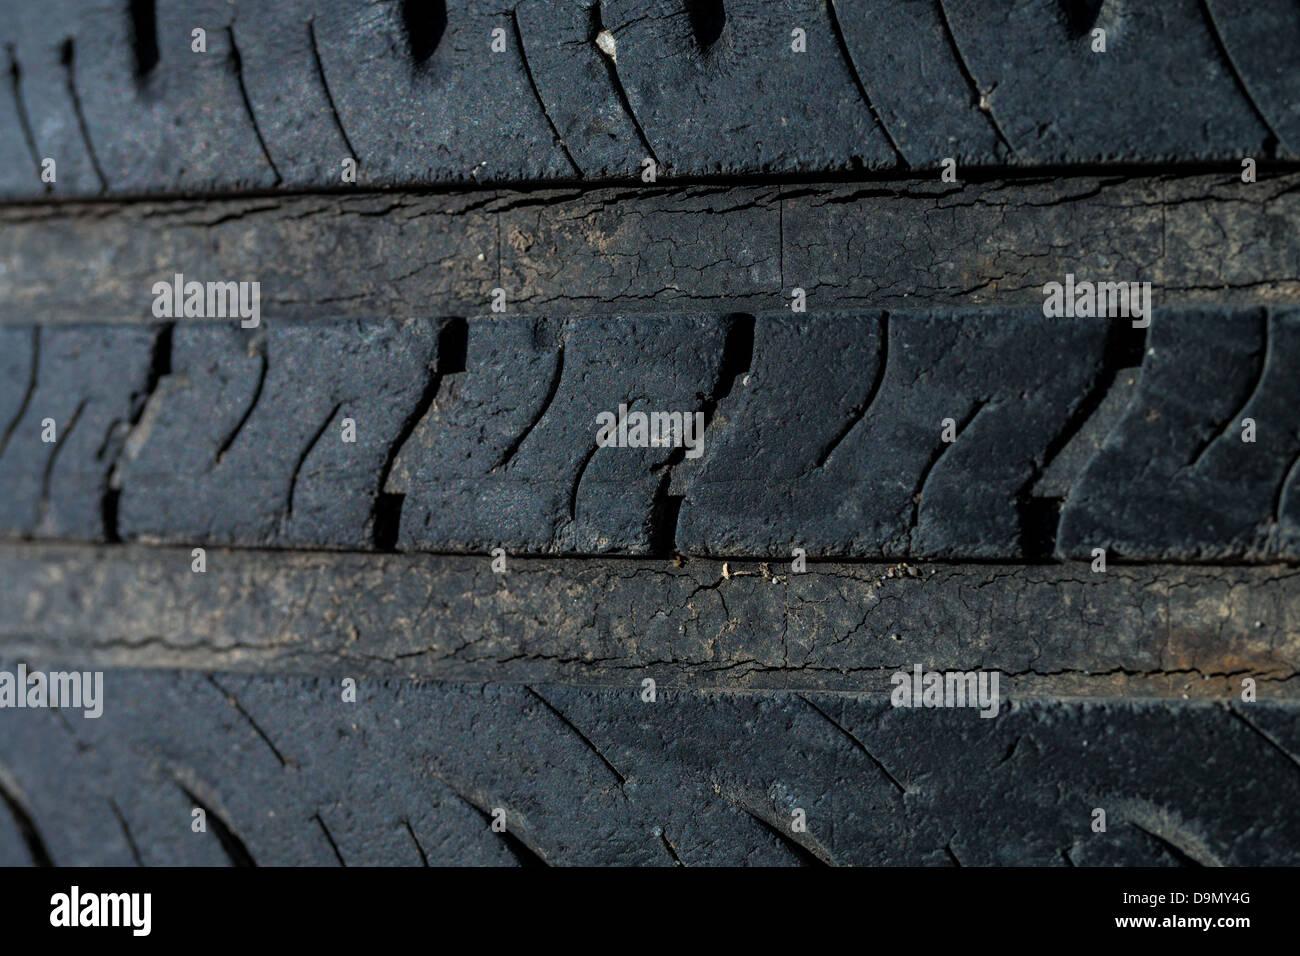 Worn tires - Stock Image